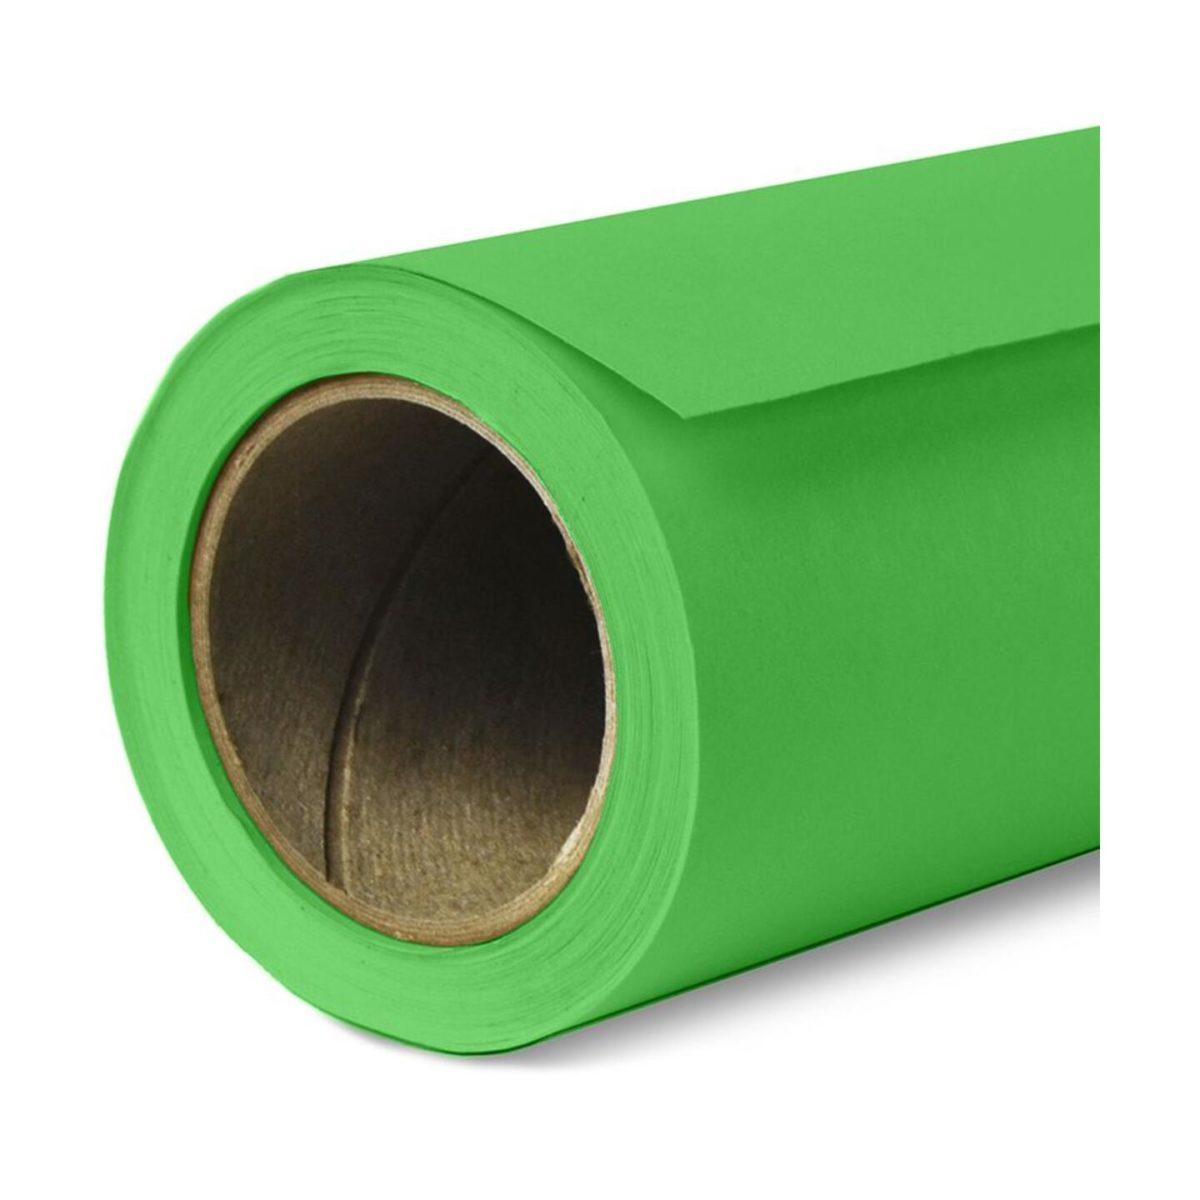 bd_backgrounds_132_veri_green_01